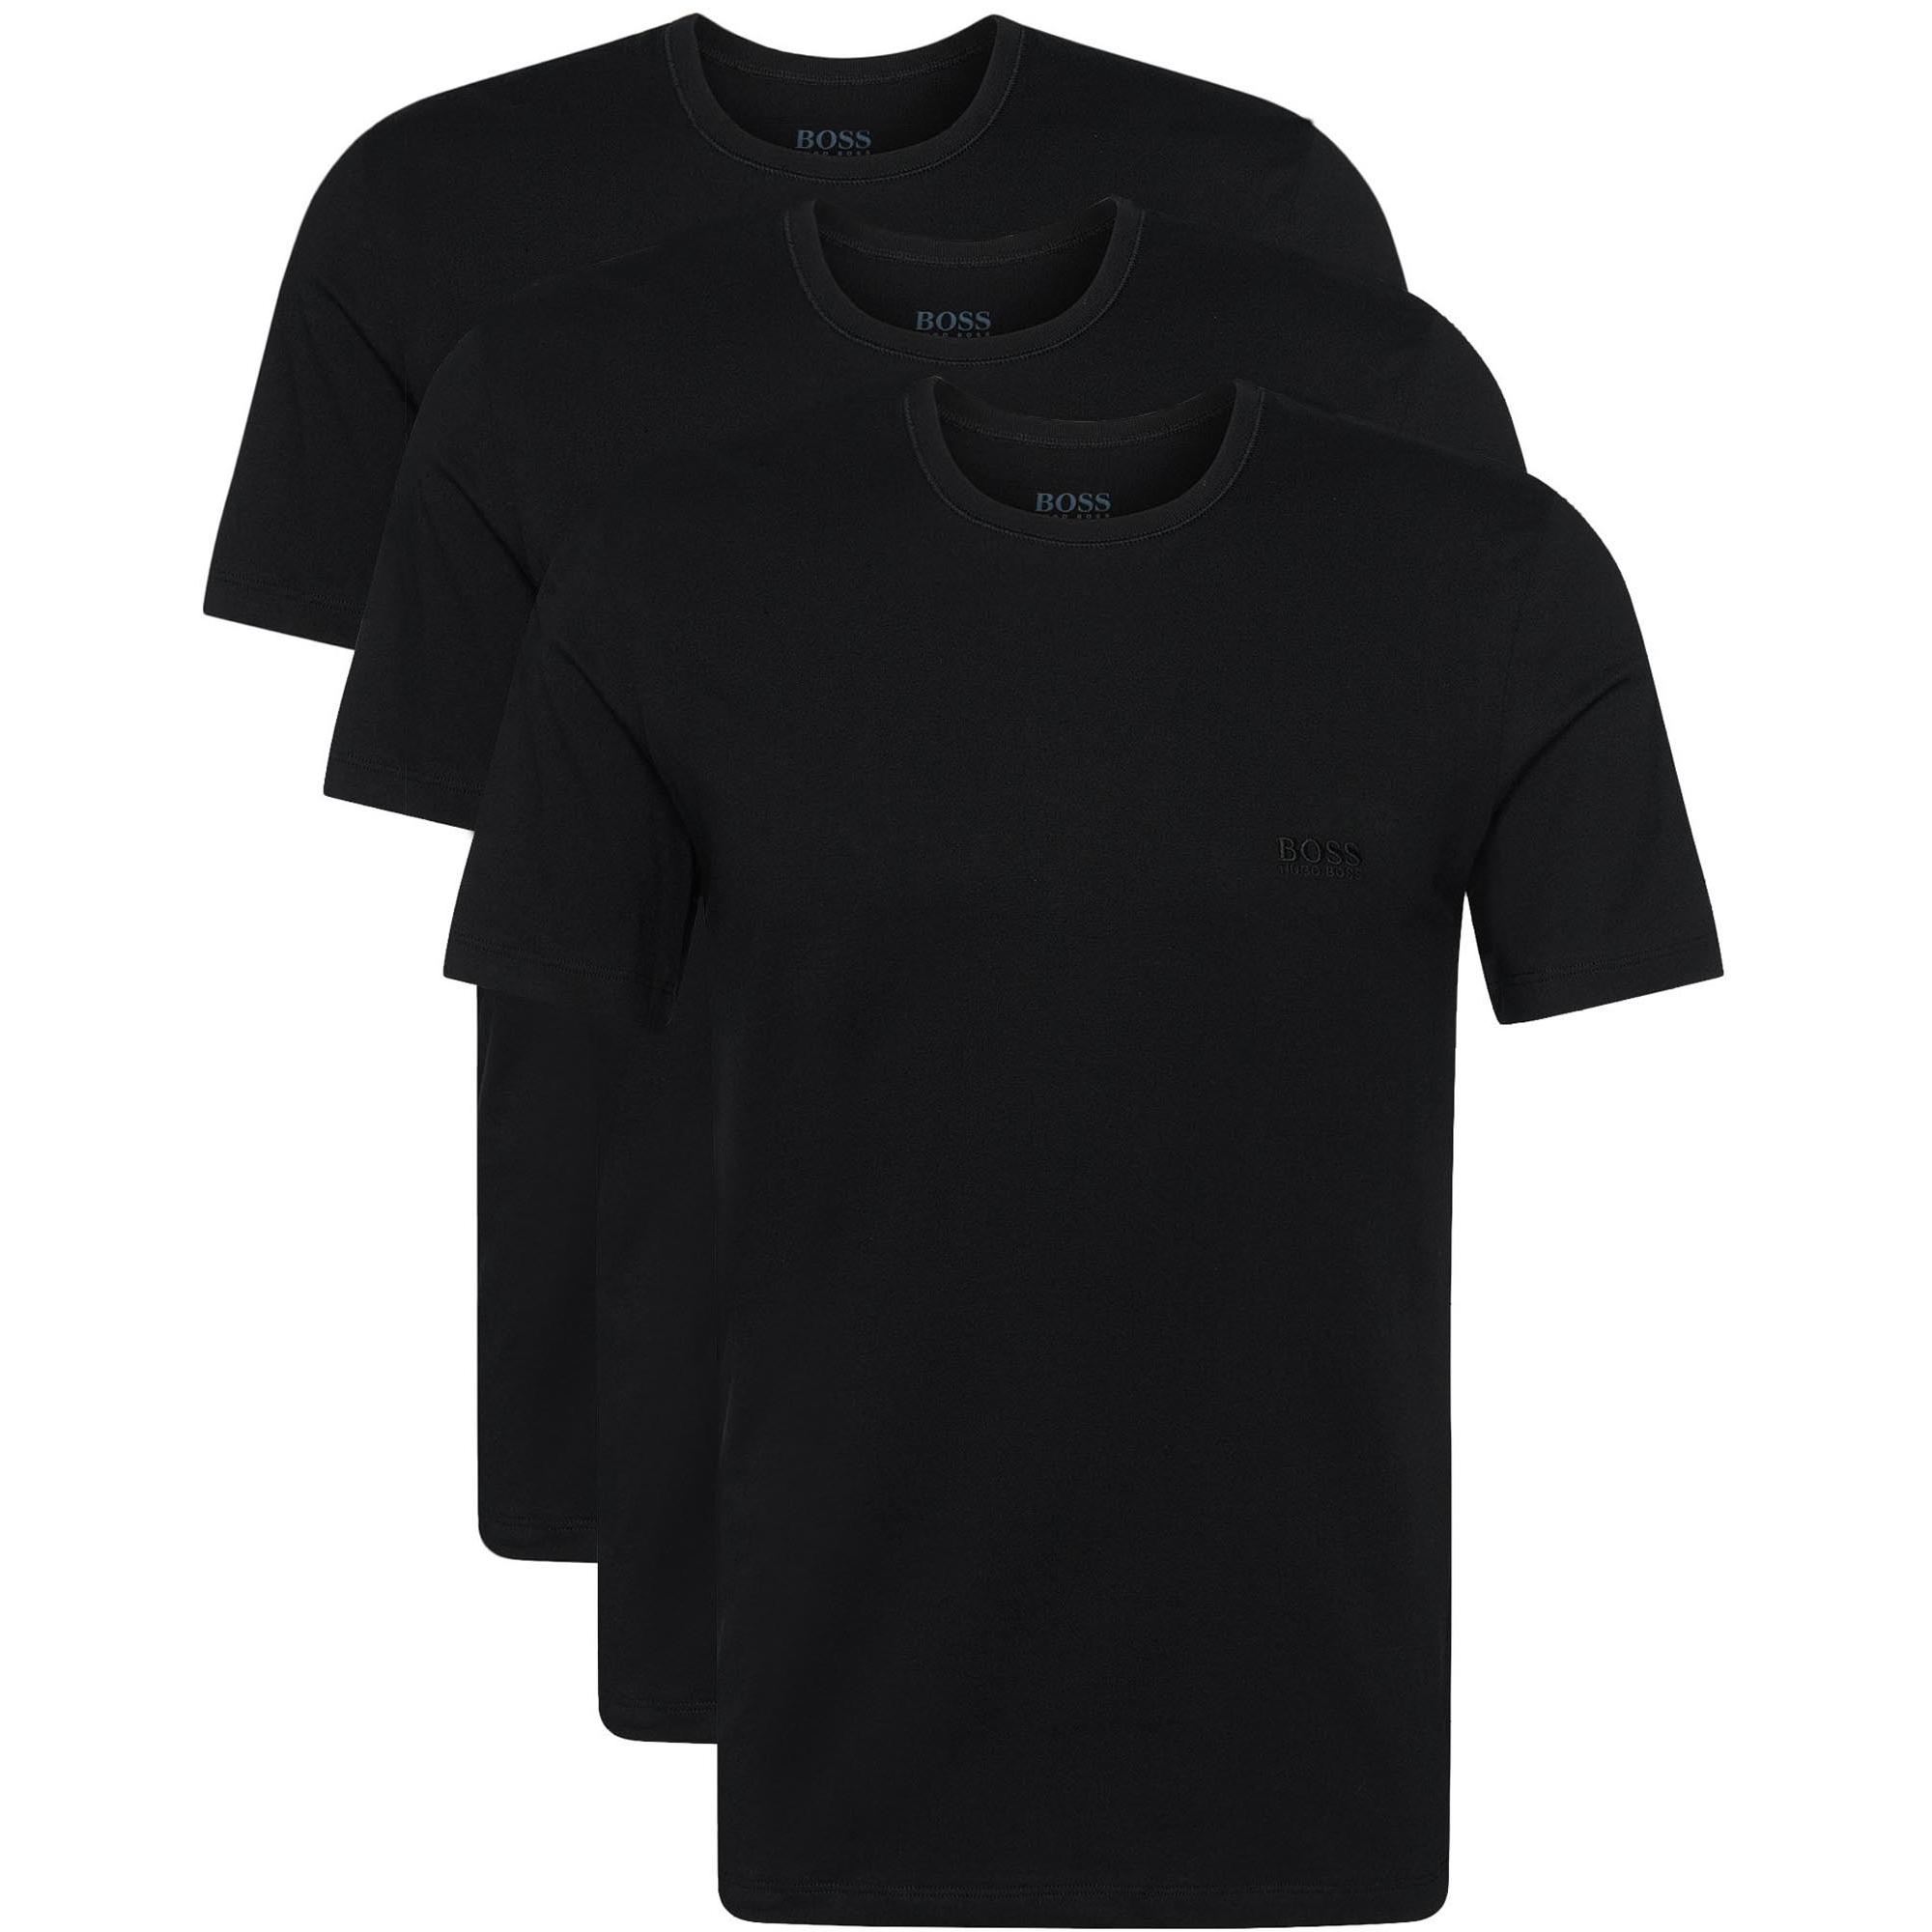 e66a0aa82 BOSS Hugo Boss 3 Pack Black Cotton T-Shirt | Stuarts London